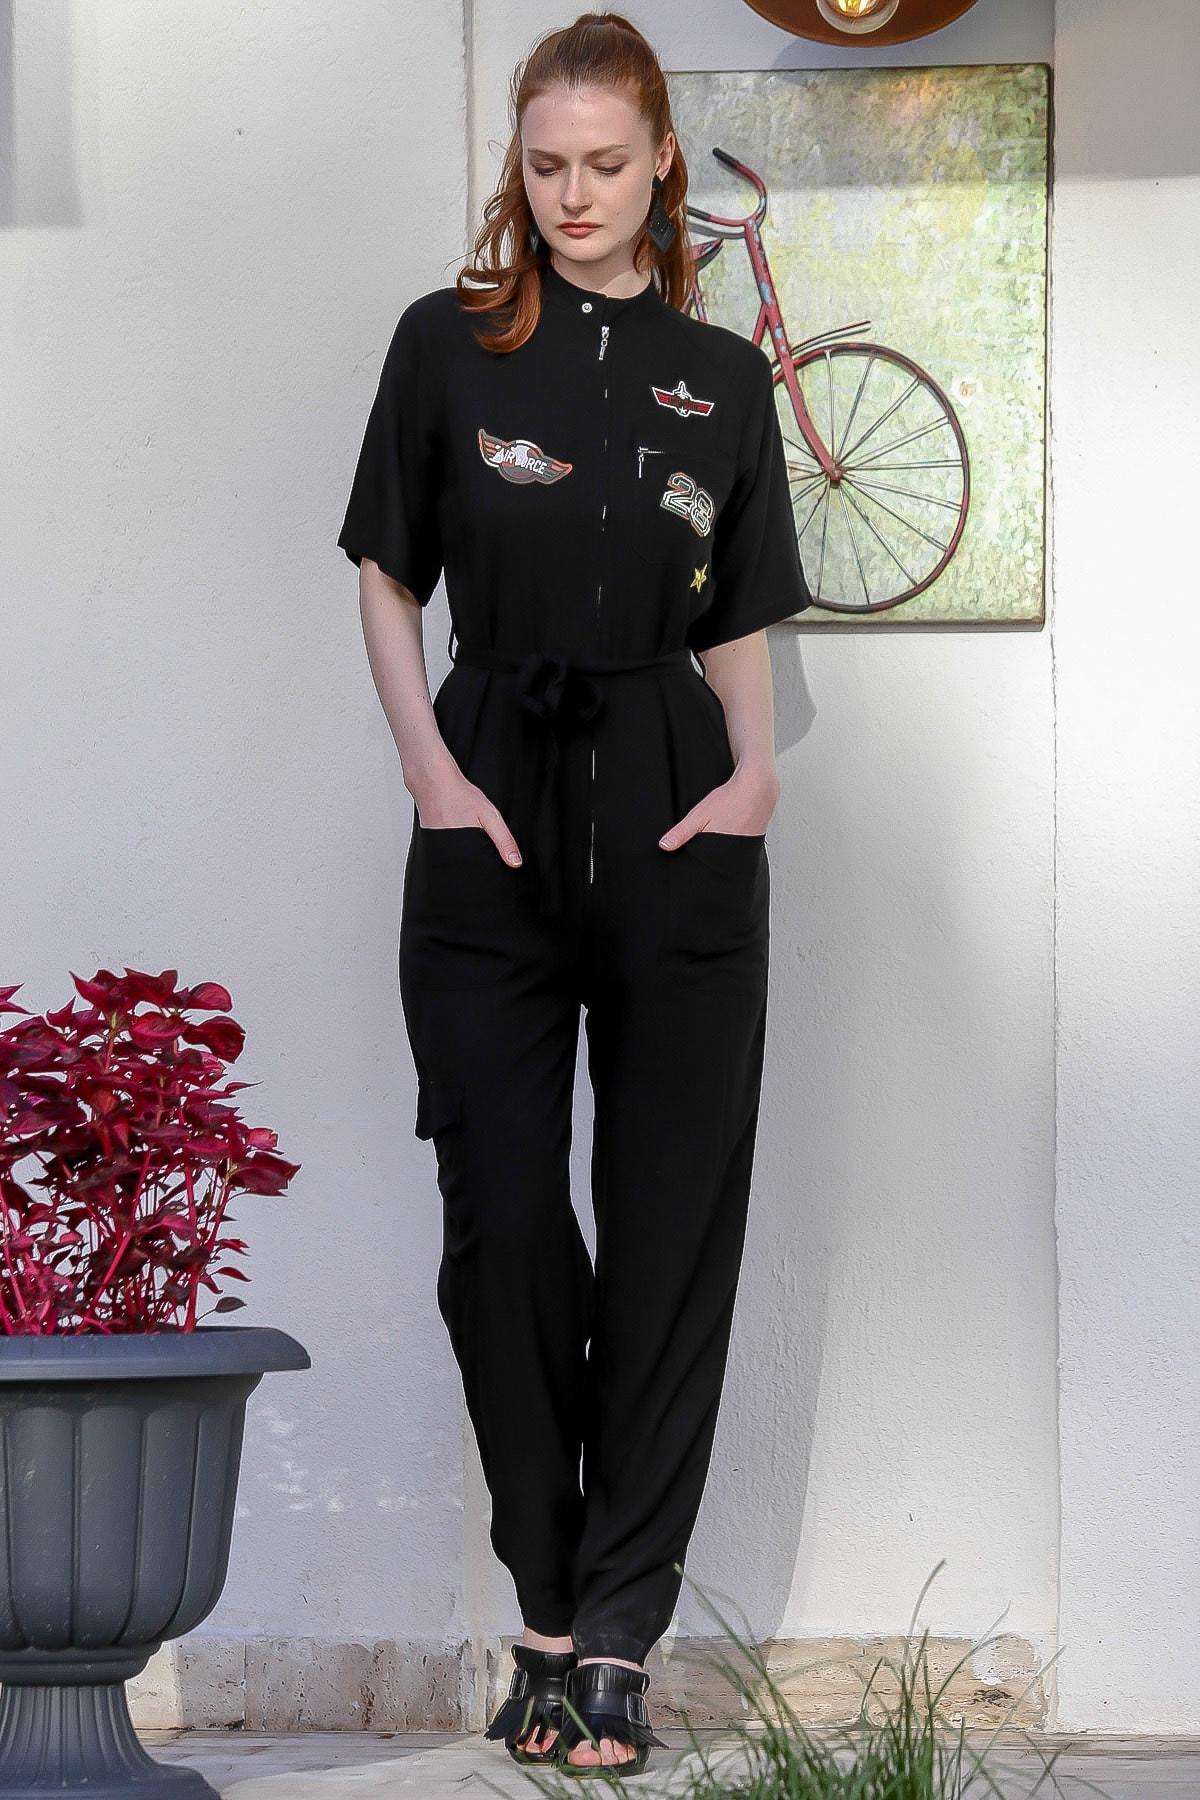 Chiccy Kadın Siyah Military Aplike Detaylı Fermuarlı Cepli Kuşaklı Dokuma Tulum M10160000El94801